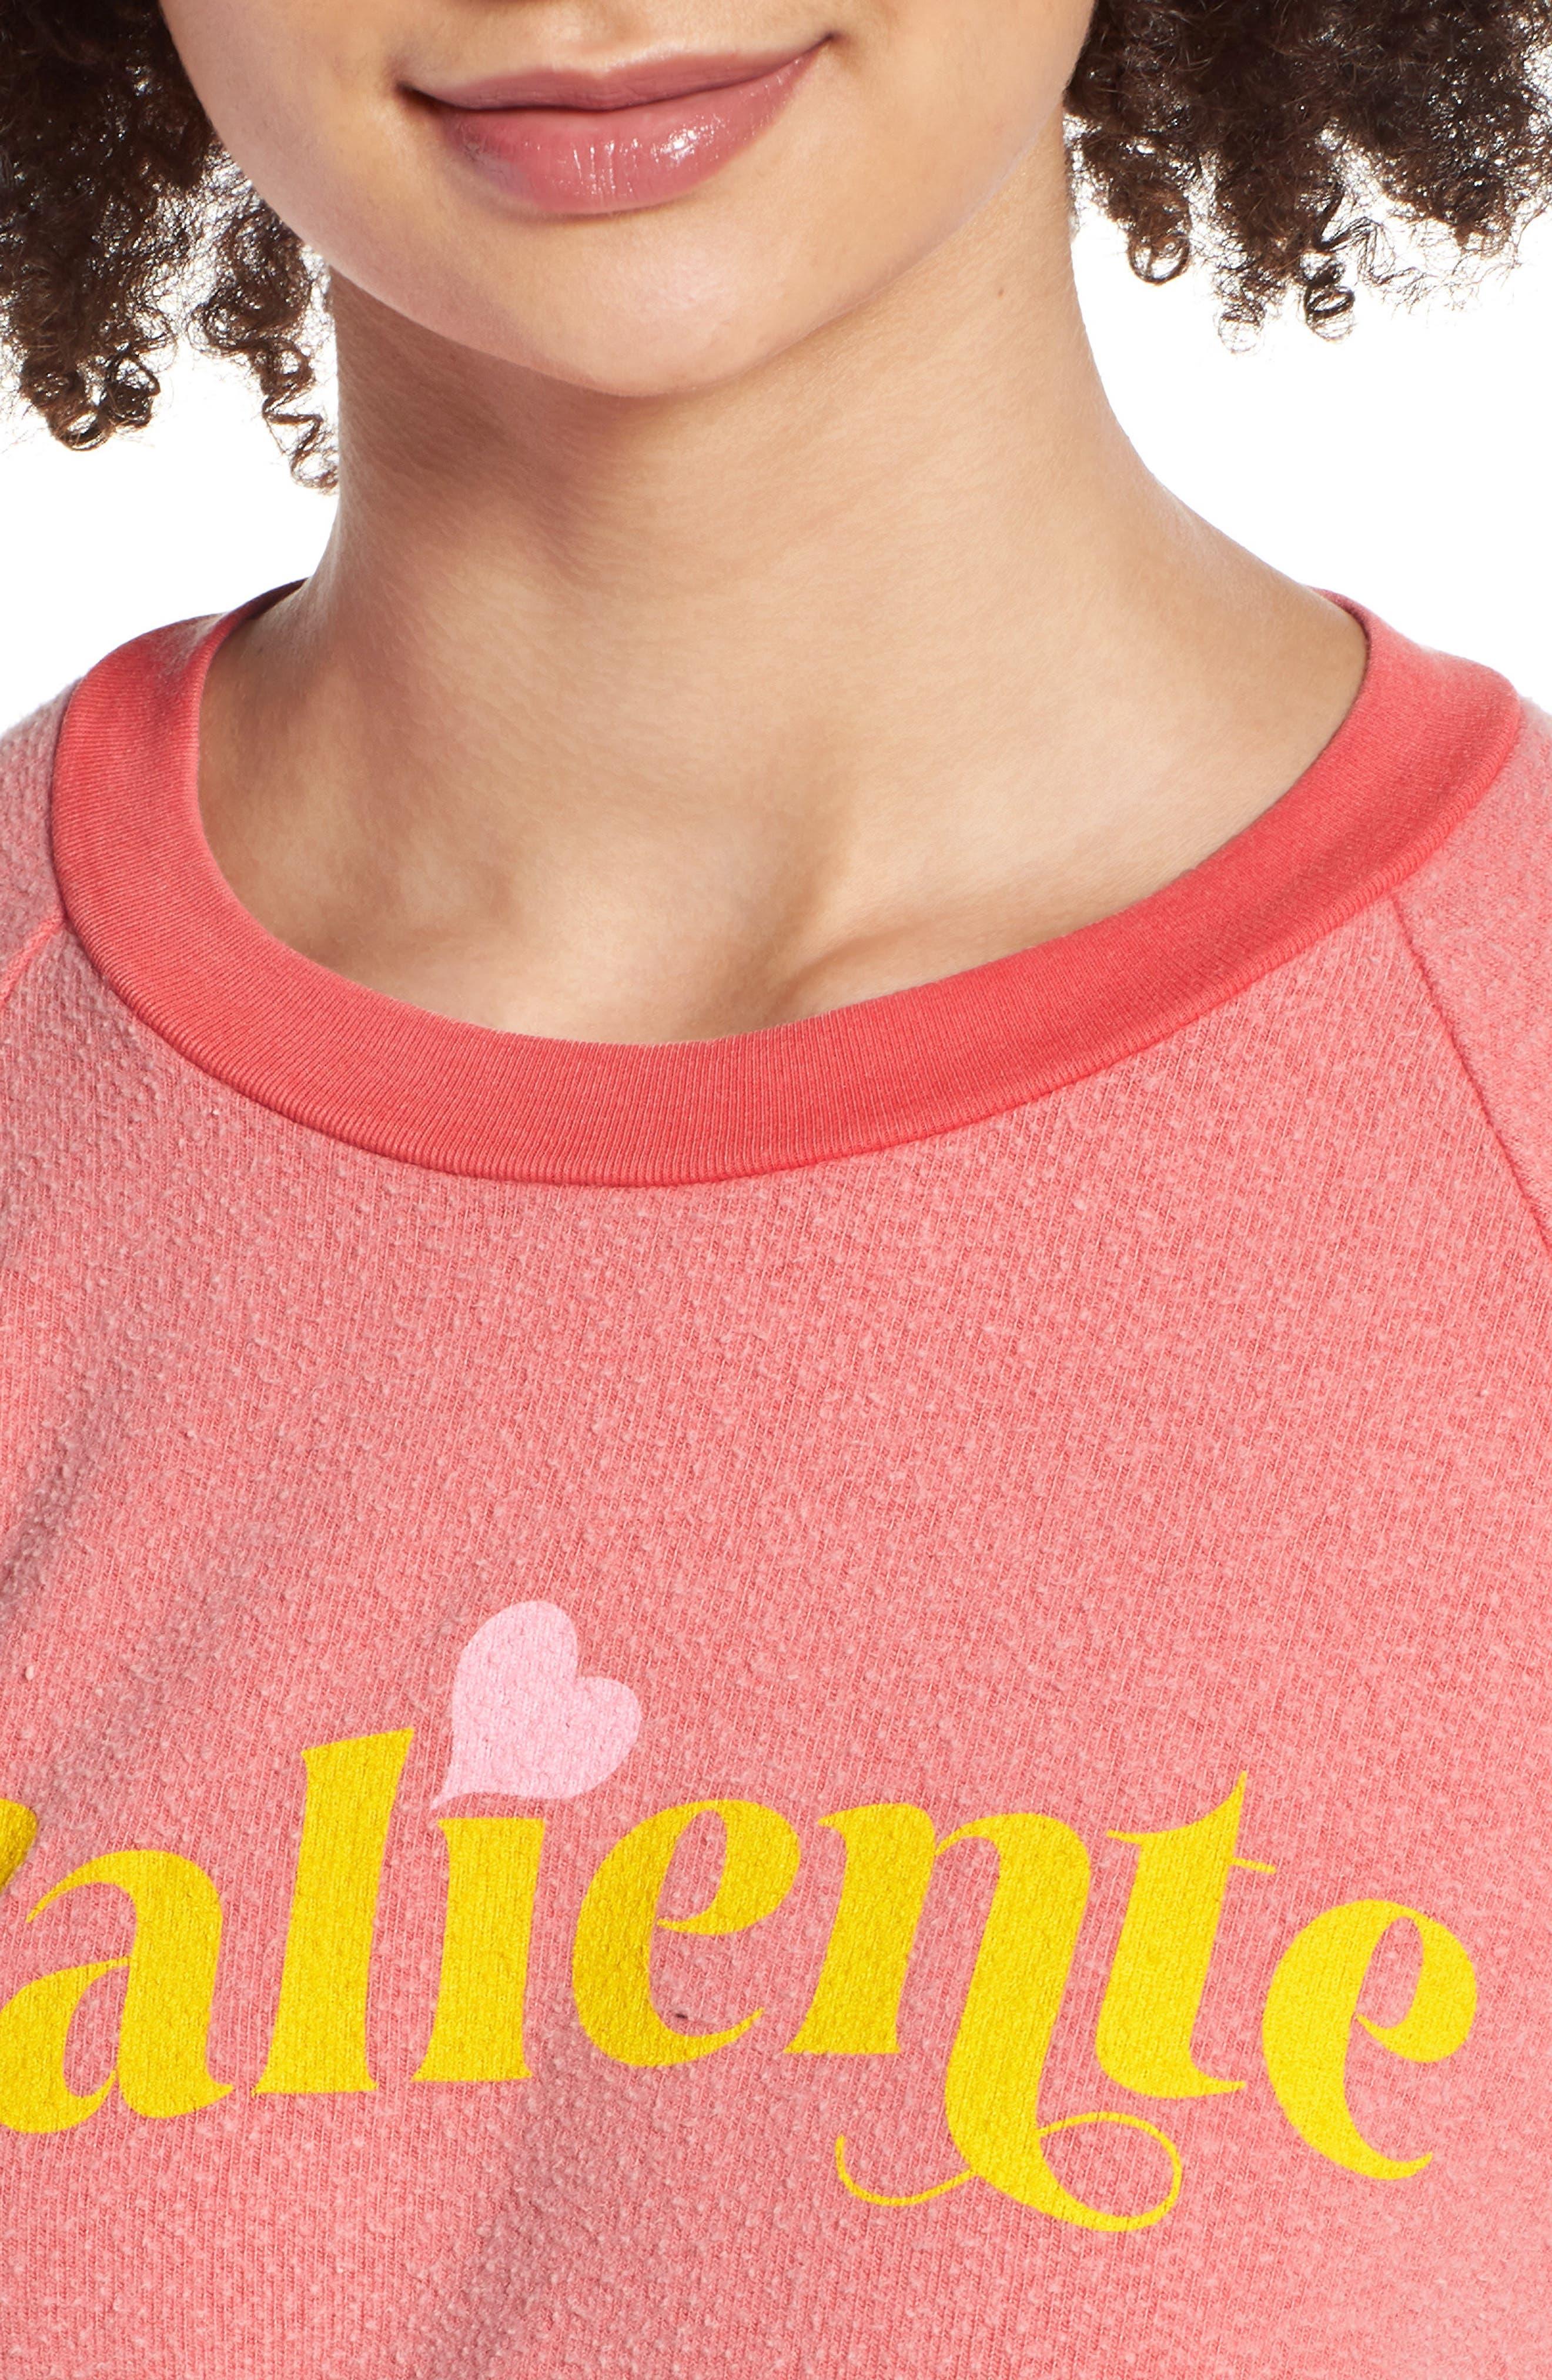 Caliente Junior Sweatshirt,                             Alternate thumbnail 4, color,                             Pigment Hot Lipstick